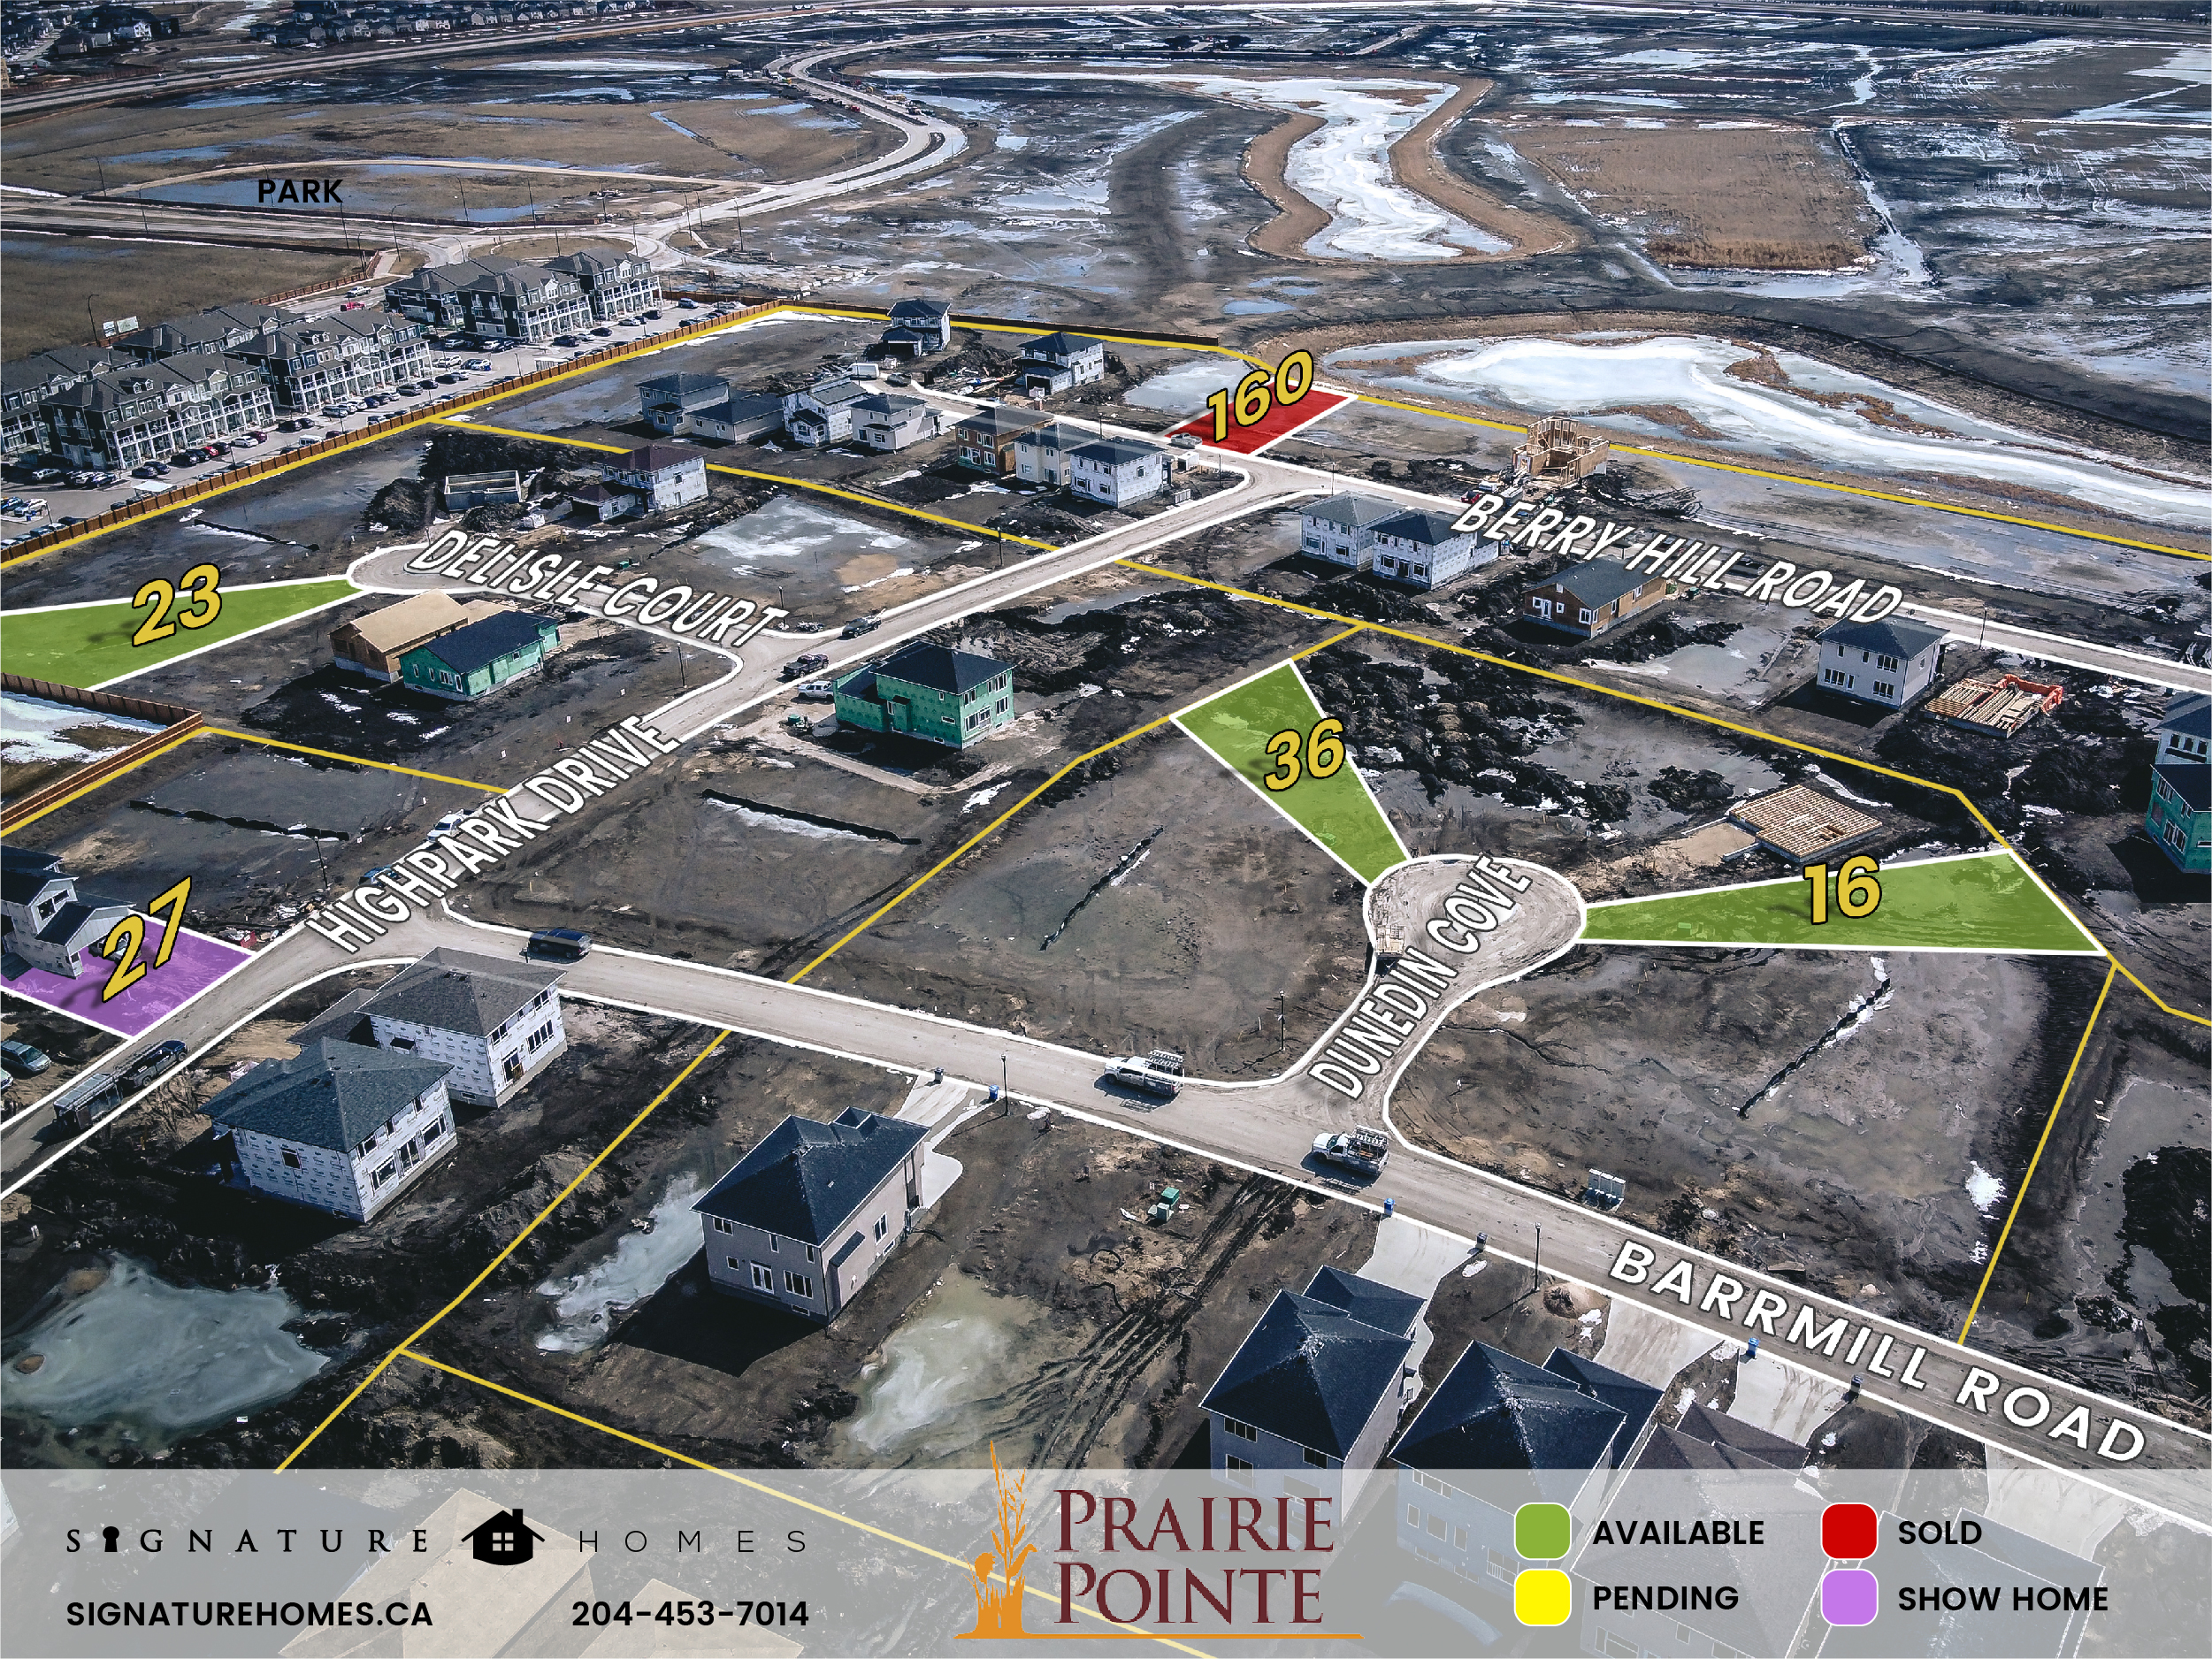 Prairie Pointe Phase 3 Map, Signature Homes, Winnipeg Manitoba